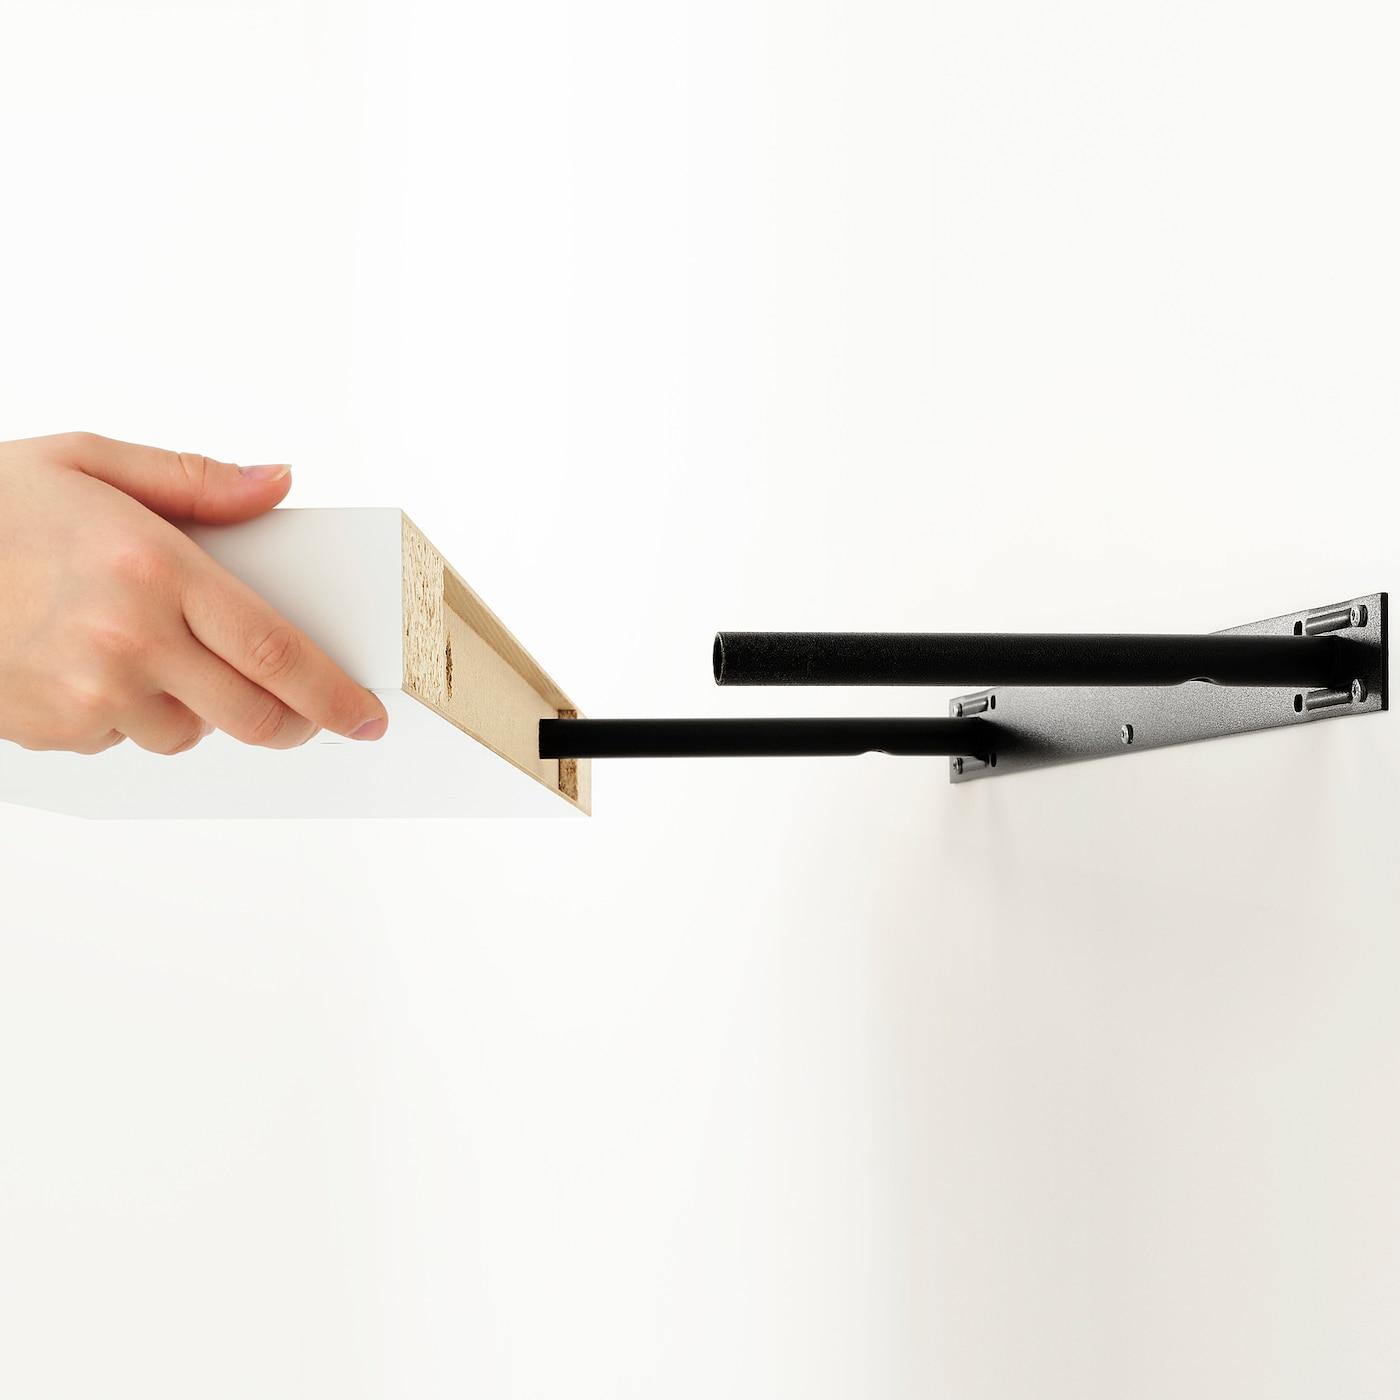 Lack Wandregal Ein Frei Schwebender Klassiker Ikea Osterreich